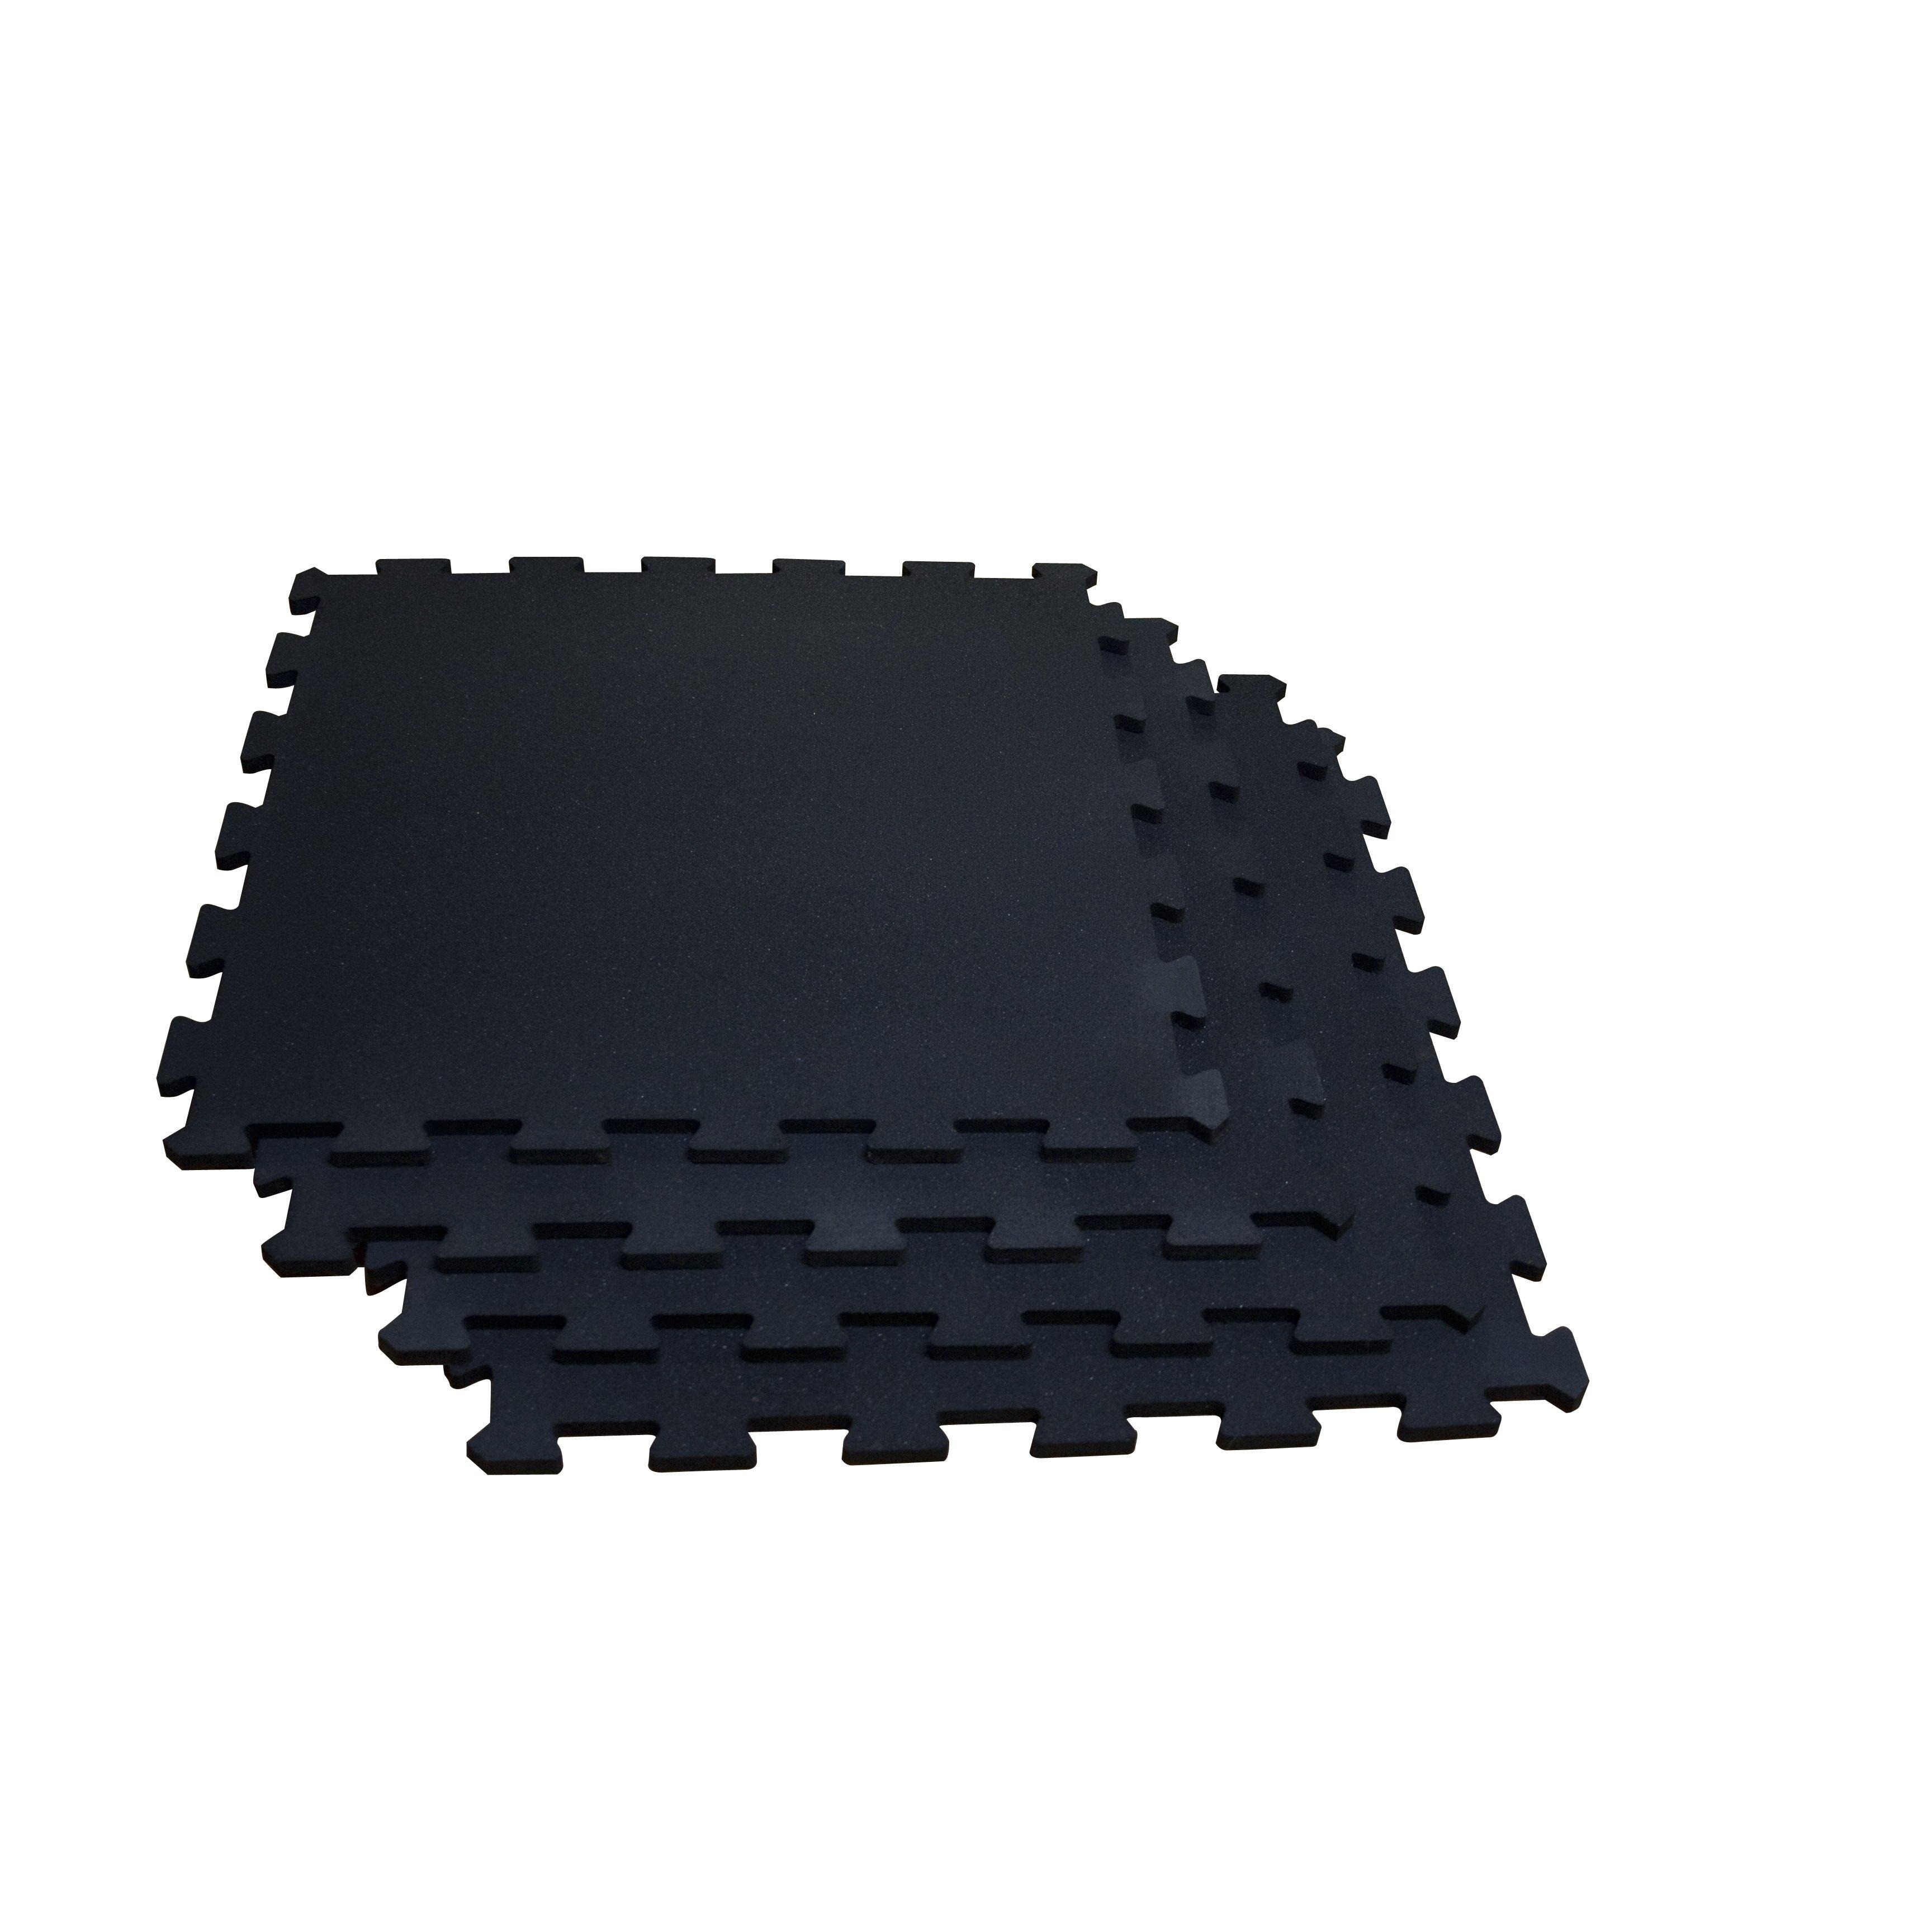 Rubber mats gym interlocking - Body Solid Interlocking Rubber Flooring